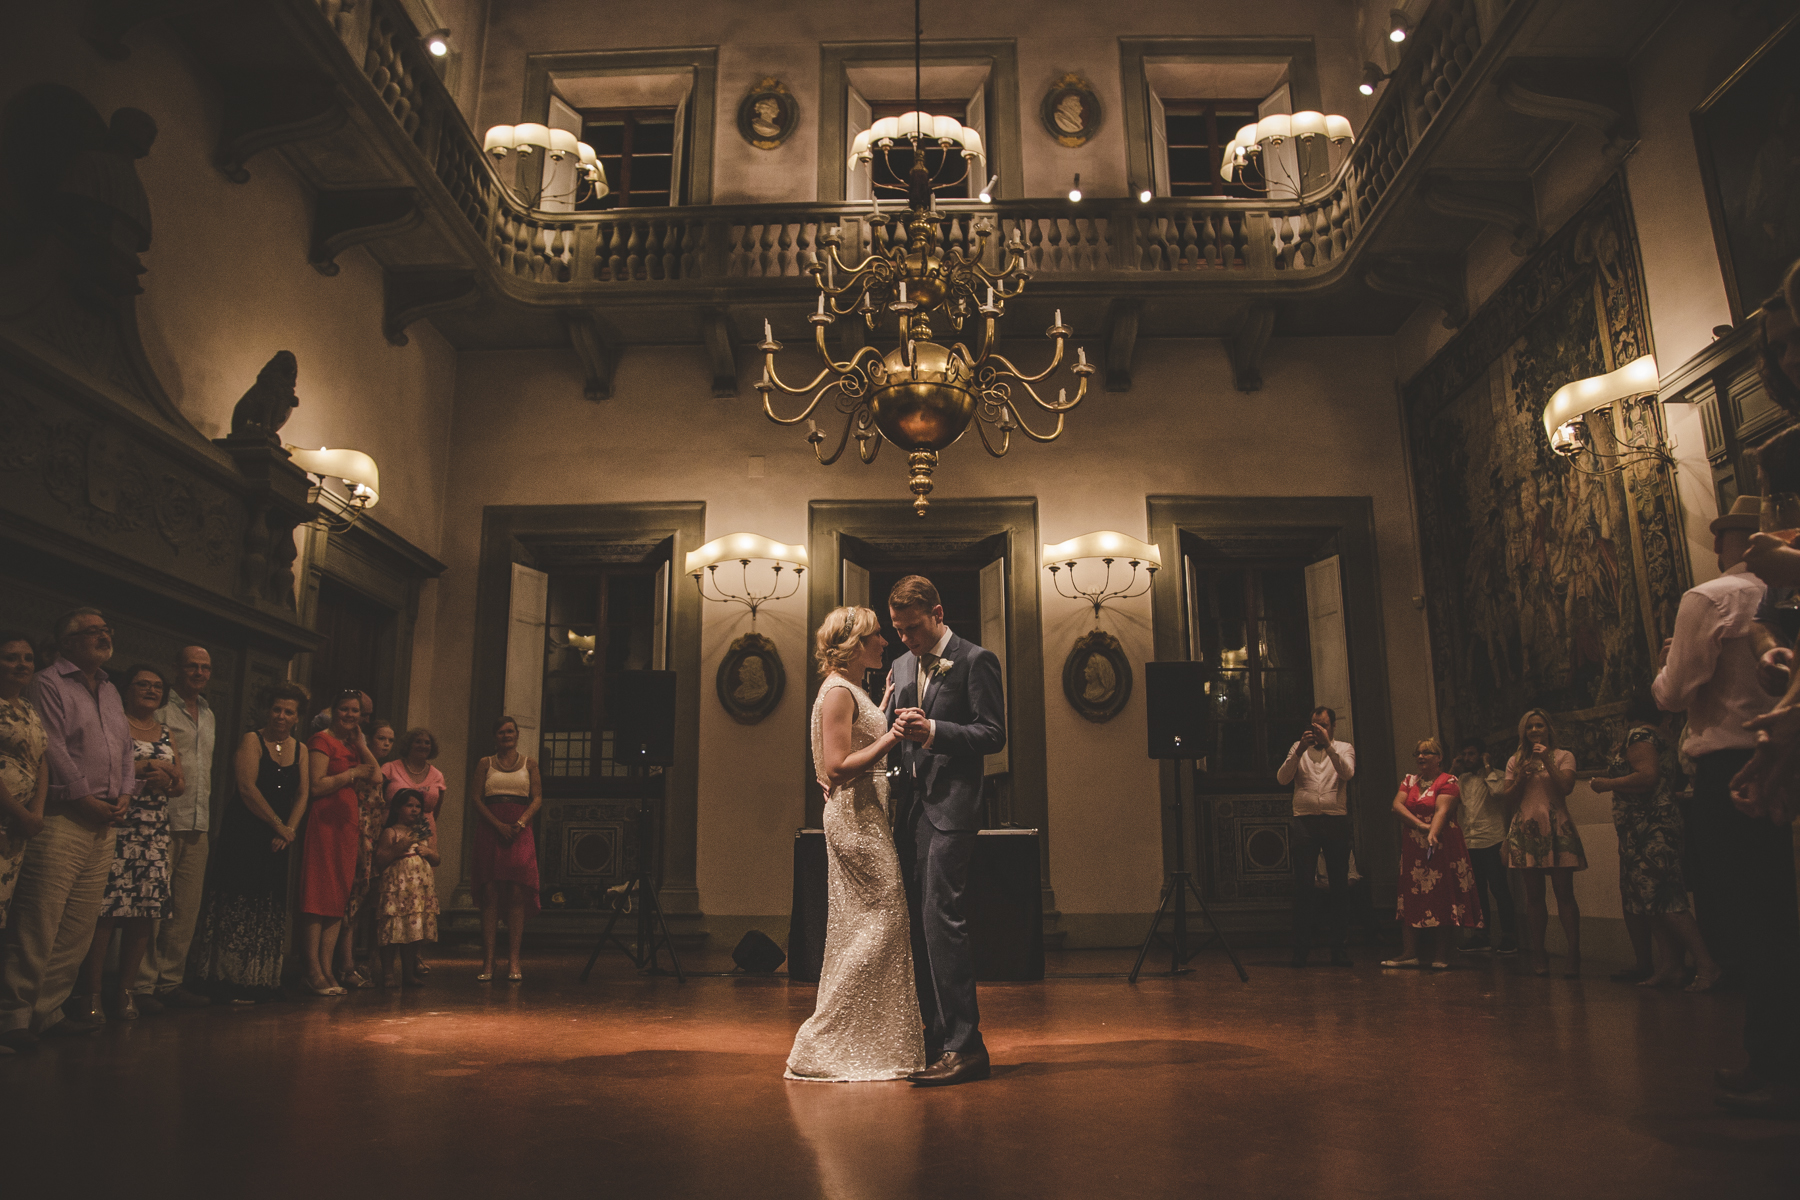 Wedding Illumination is important